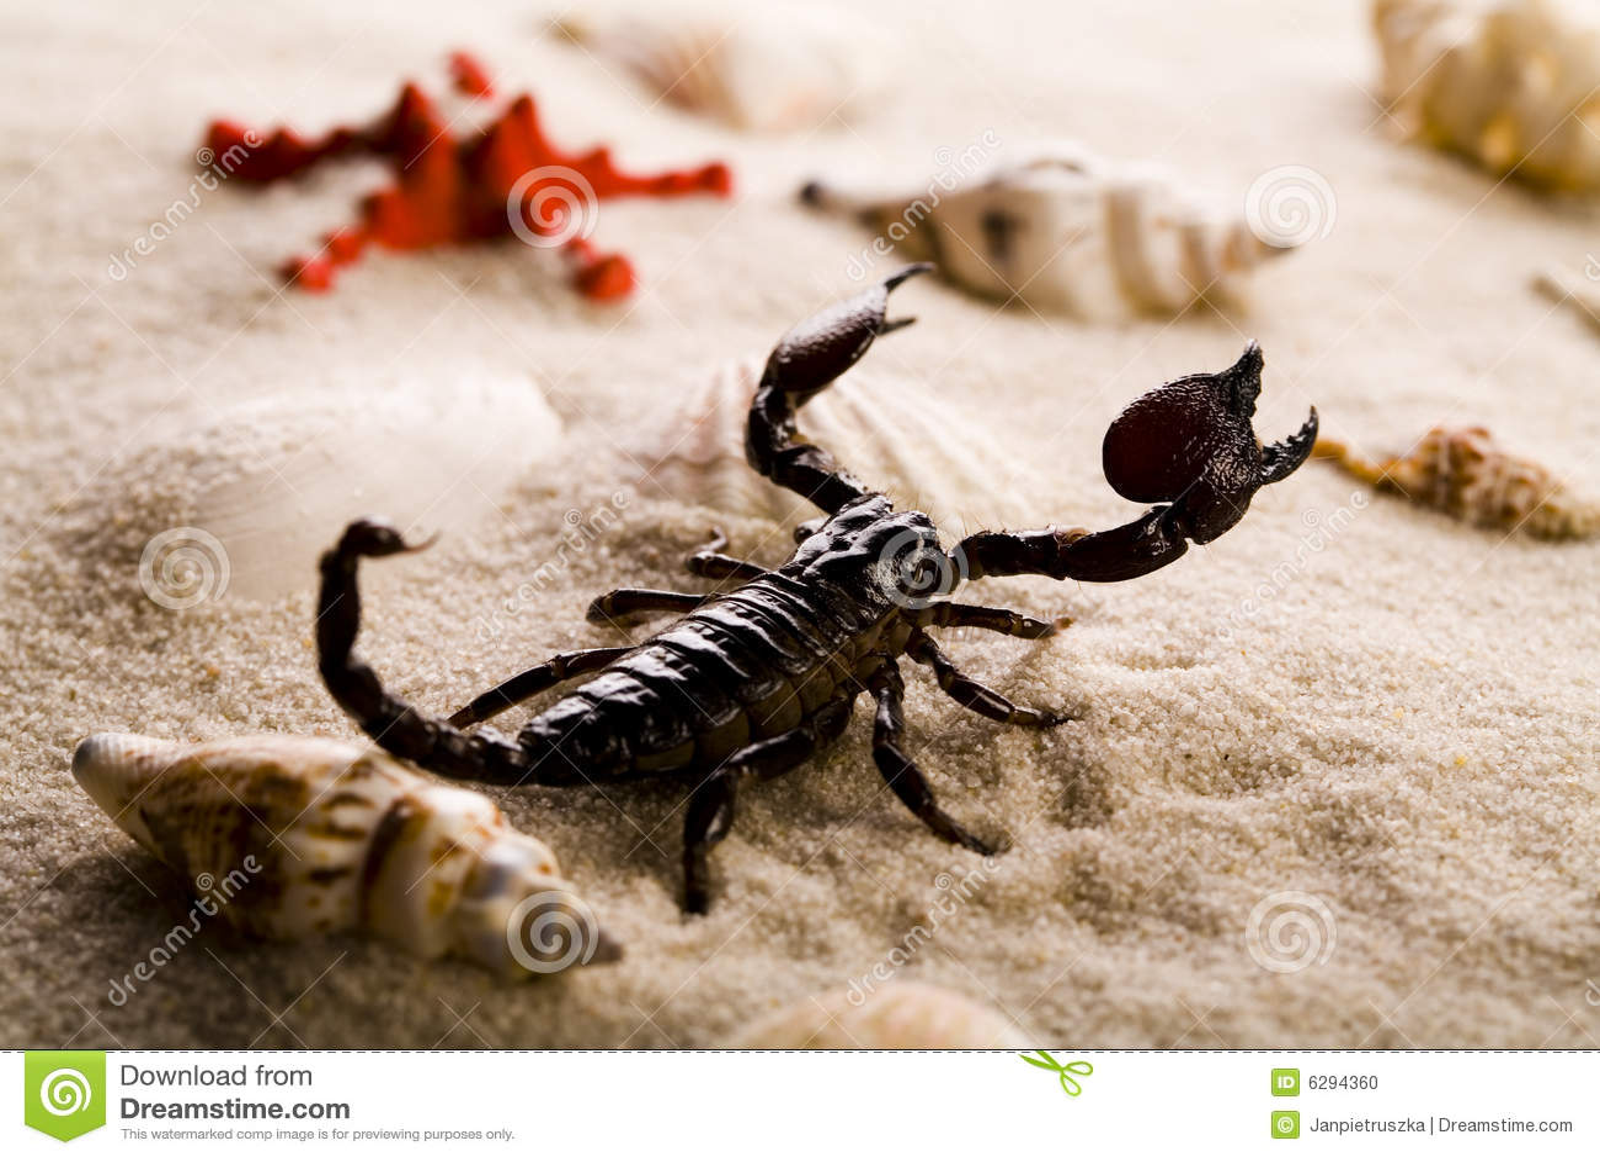 shells sand und skorpion stockfoto bild 6294360. Black Bedroom Furniture Sets. Home Design Ideas